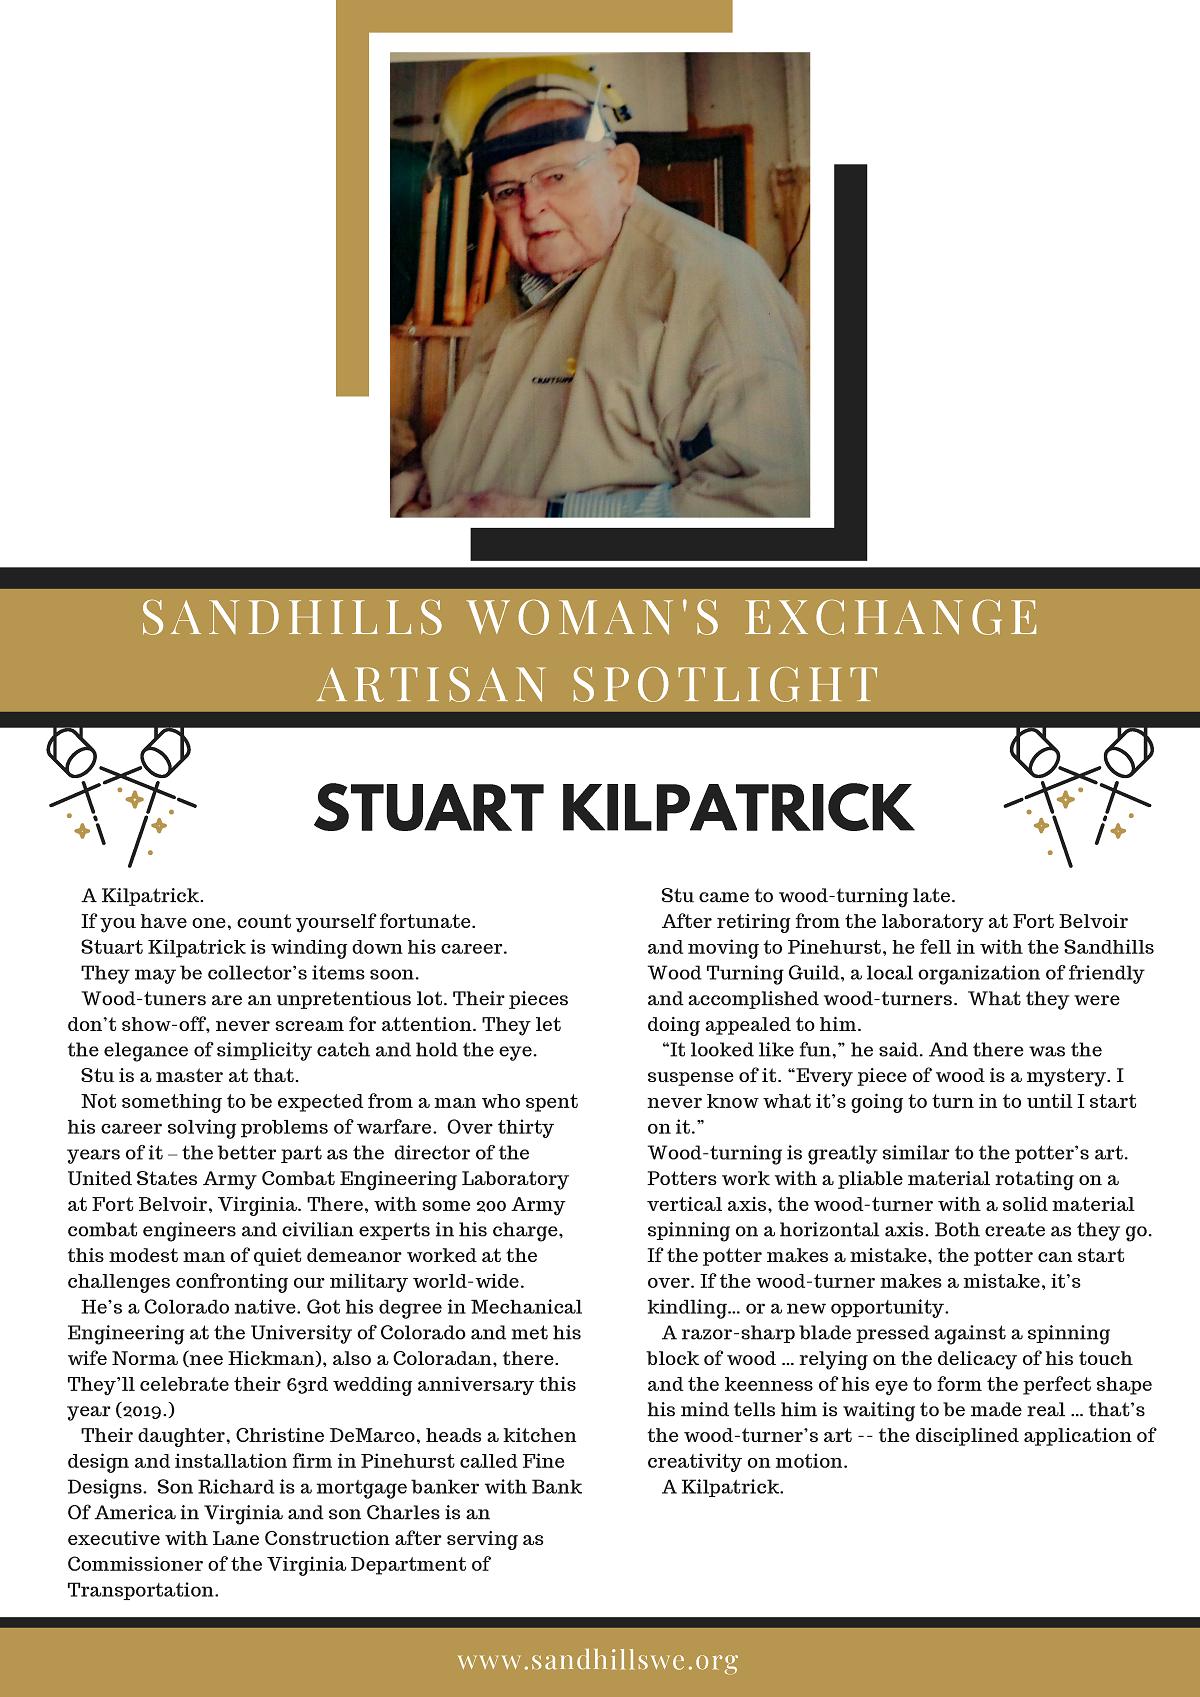 Sandhills Woman's Exchange Spotlight - Stuart Kilpatrick